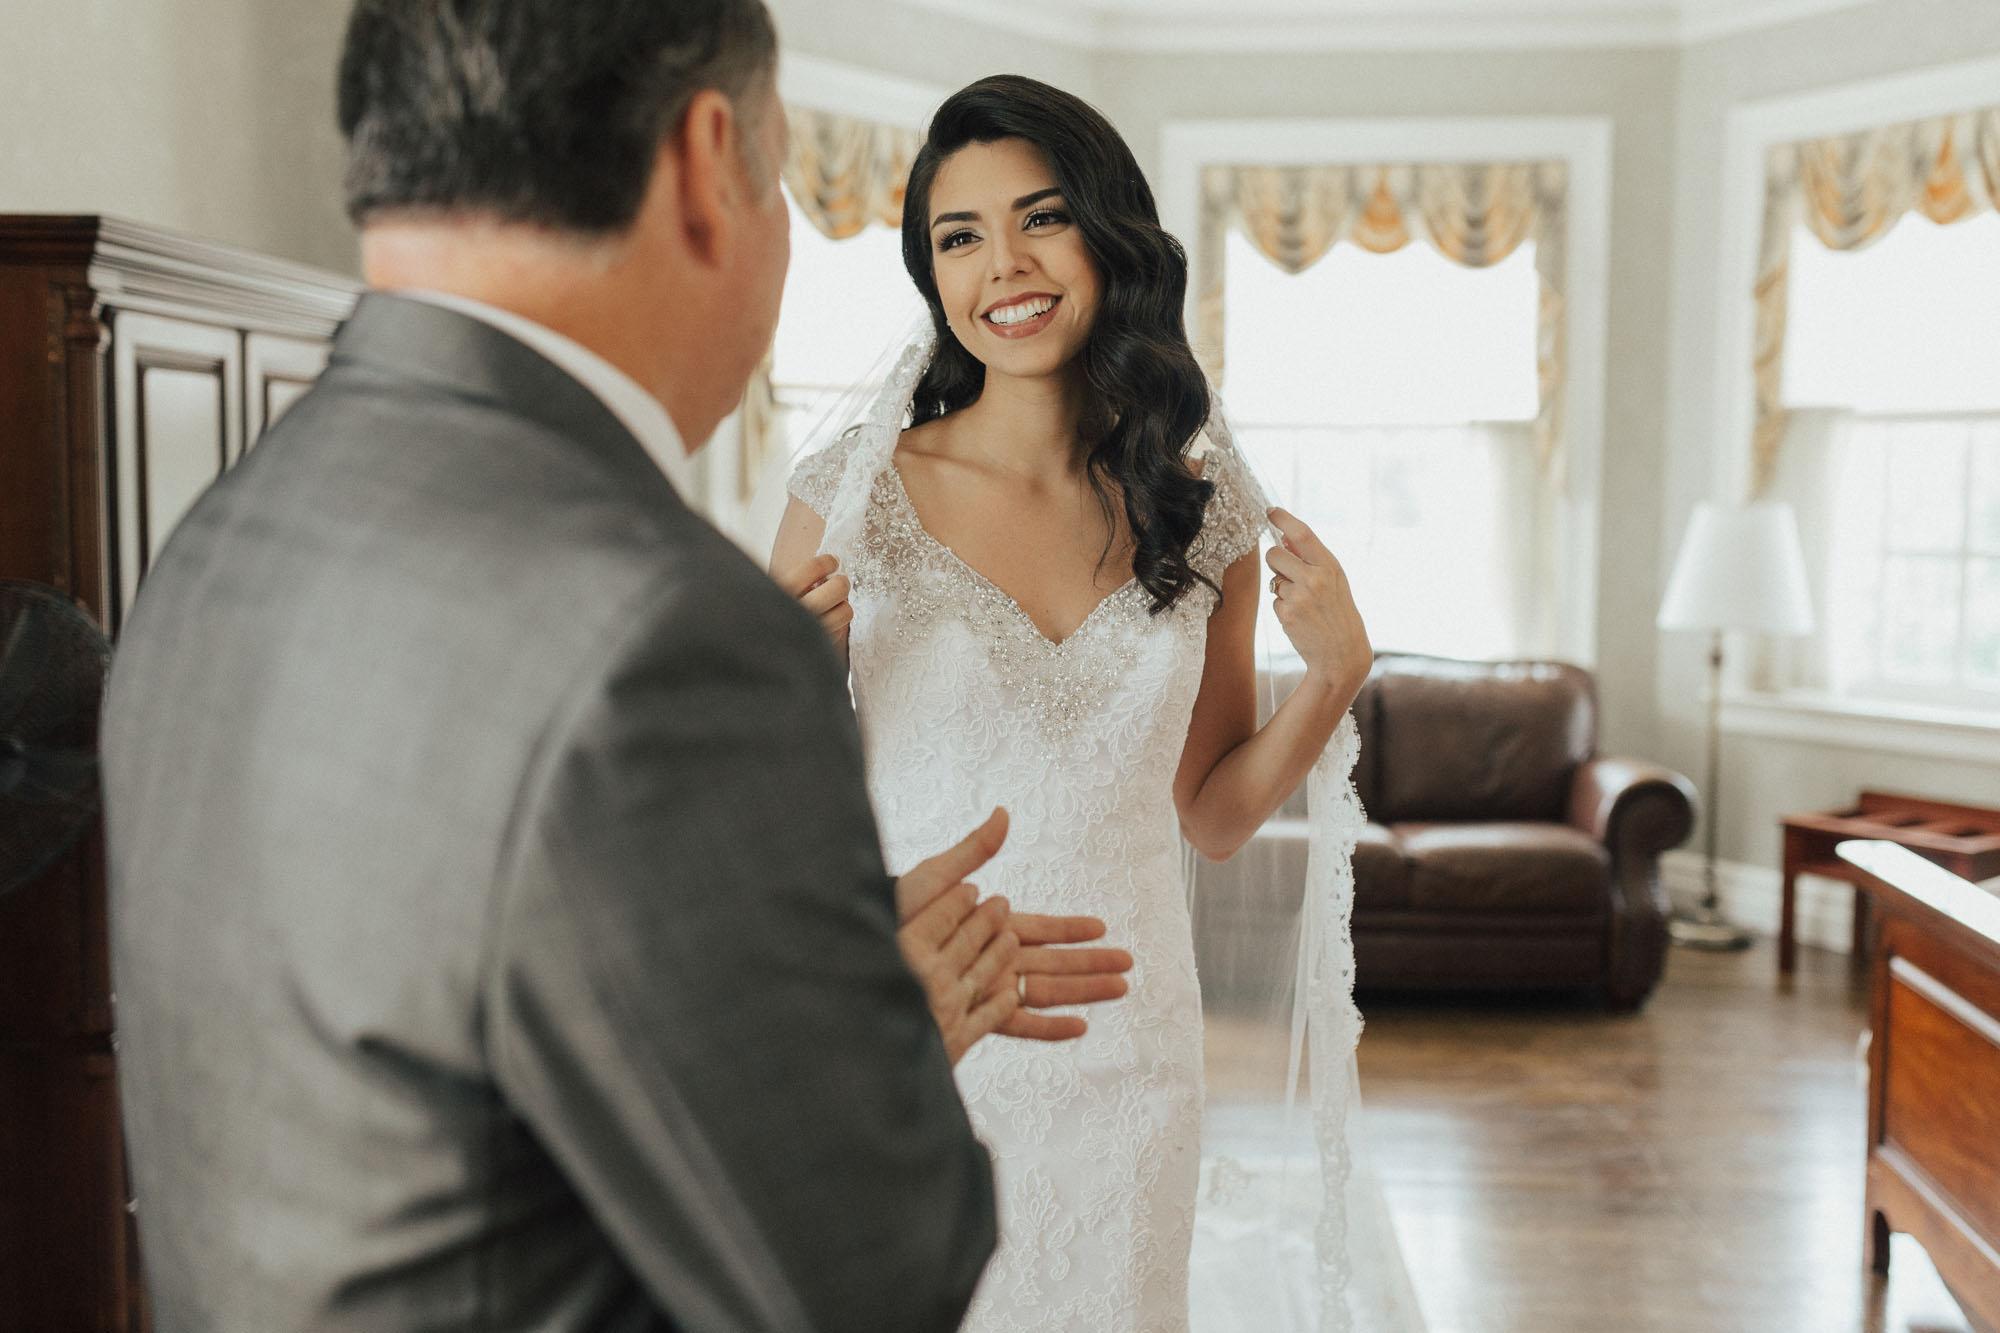 champaign_il_wedding_photography-0100.jpg